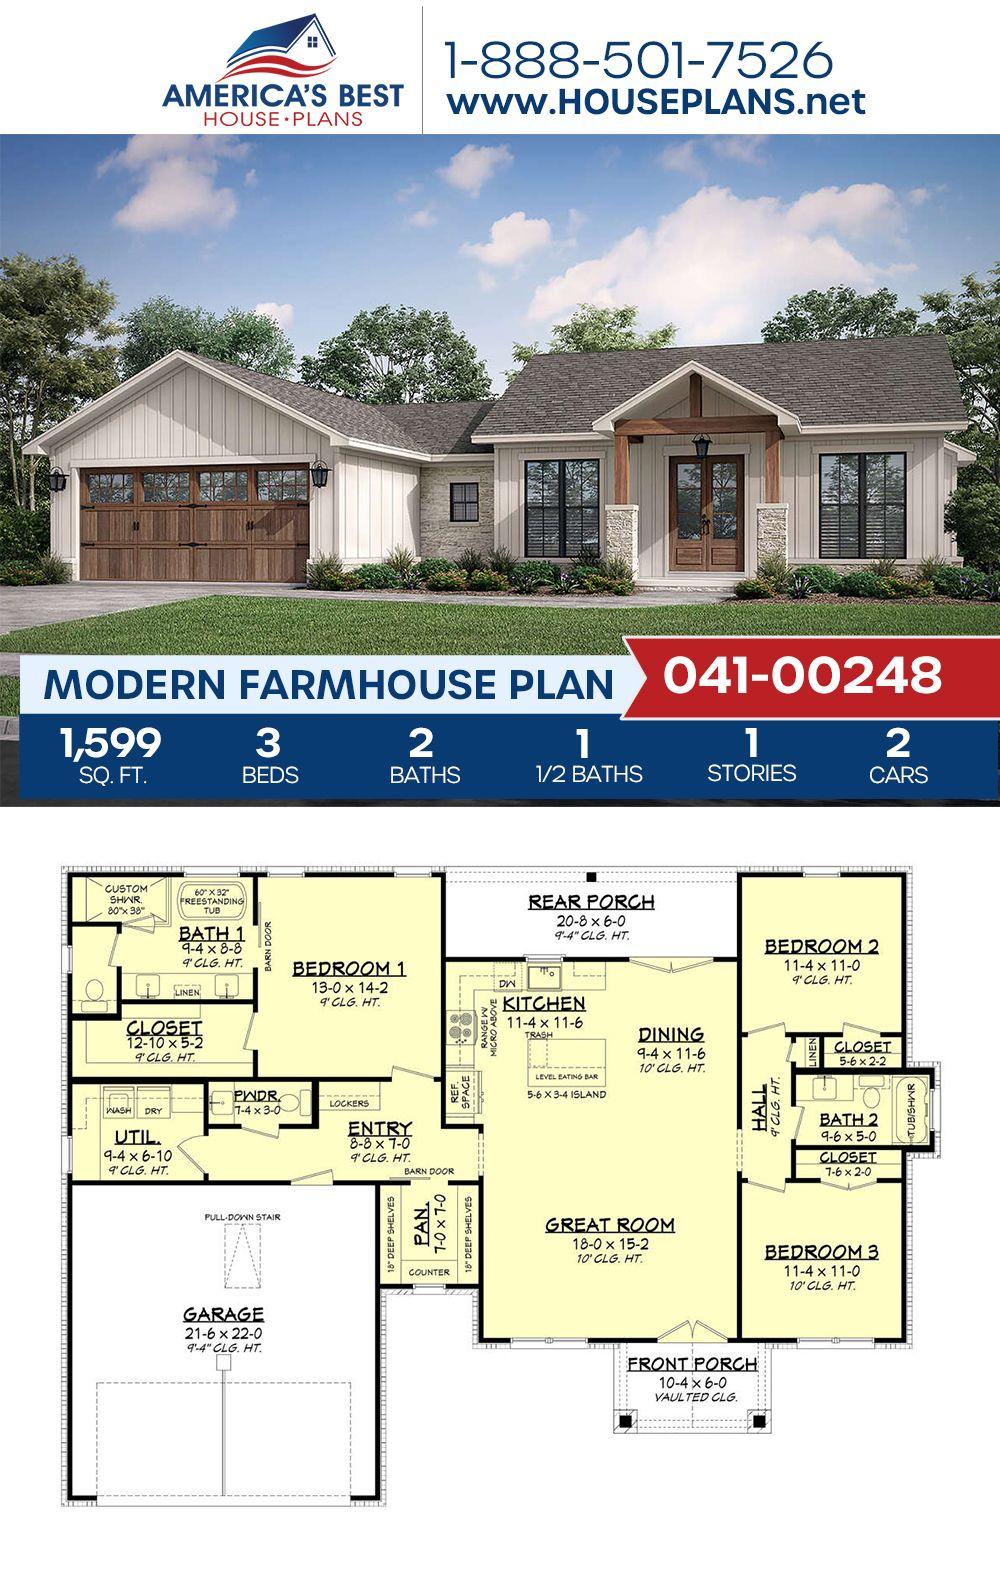 House Plan 041 00248 Modern Farmhouse Plan 1 599 Square Feet 3 Bedrooms 2 5 Bathrooms In 2021 Modern Farmhouse Plans Farmhouse Plans Open House Plans